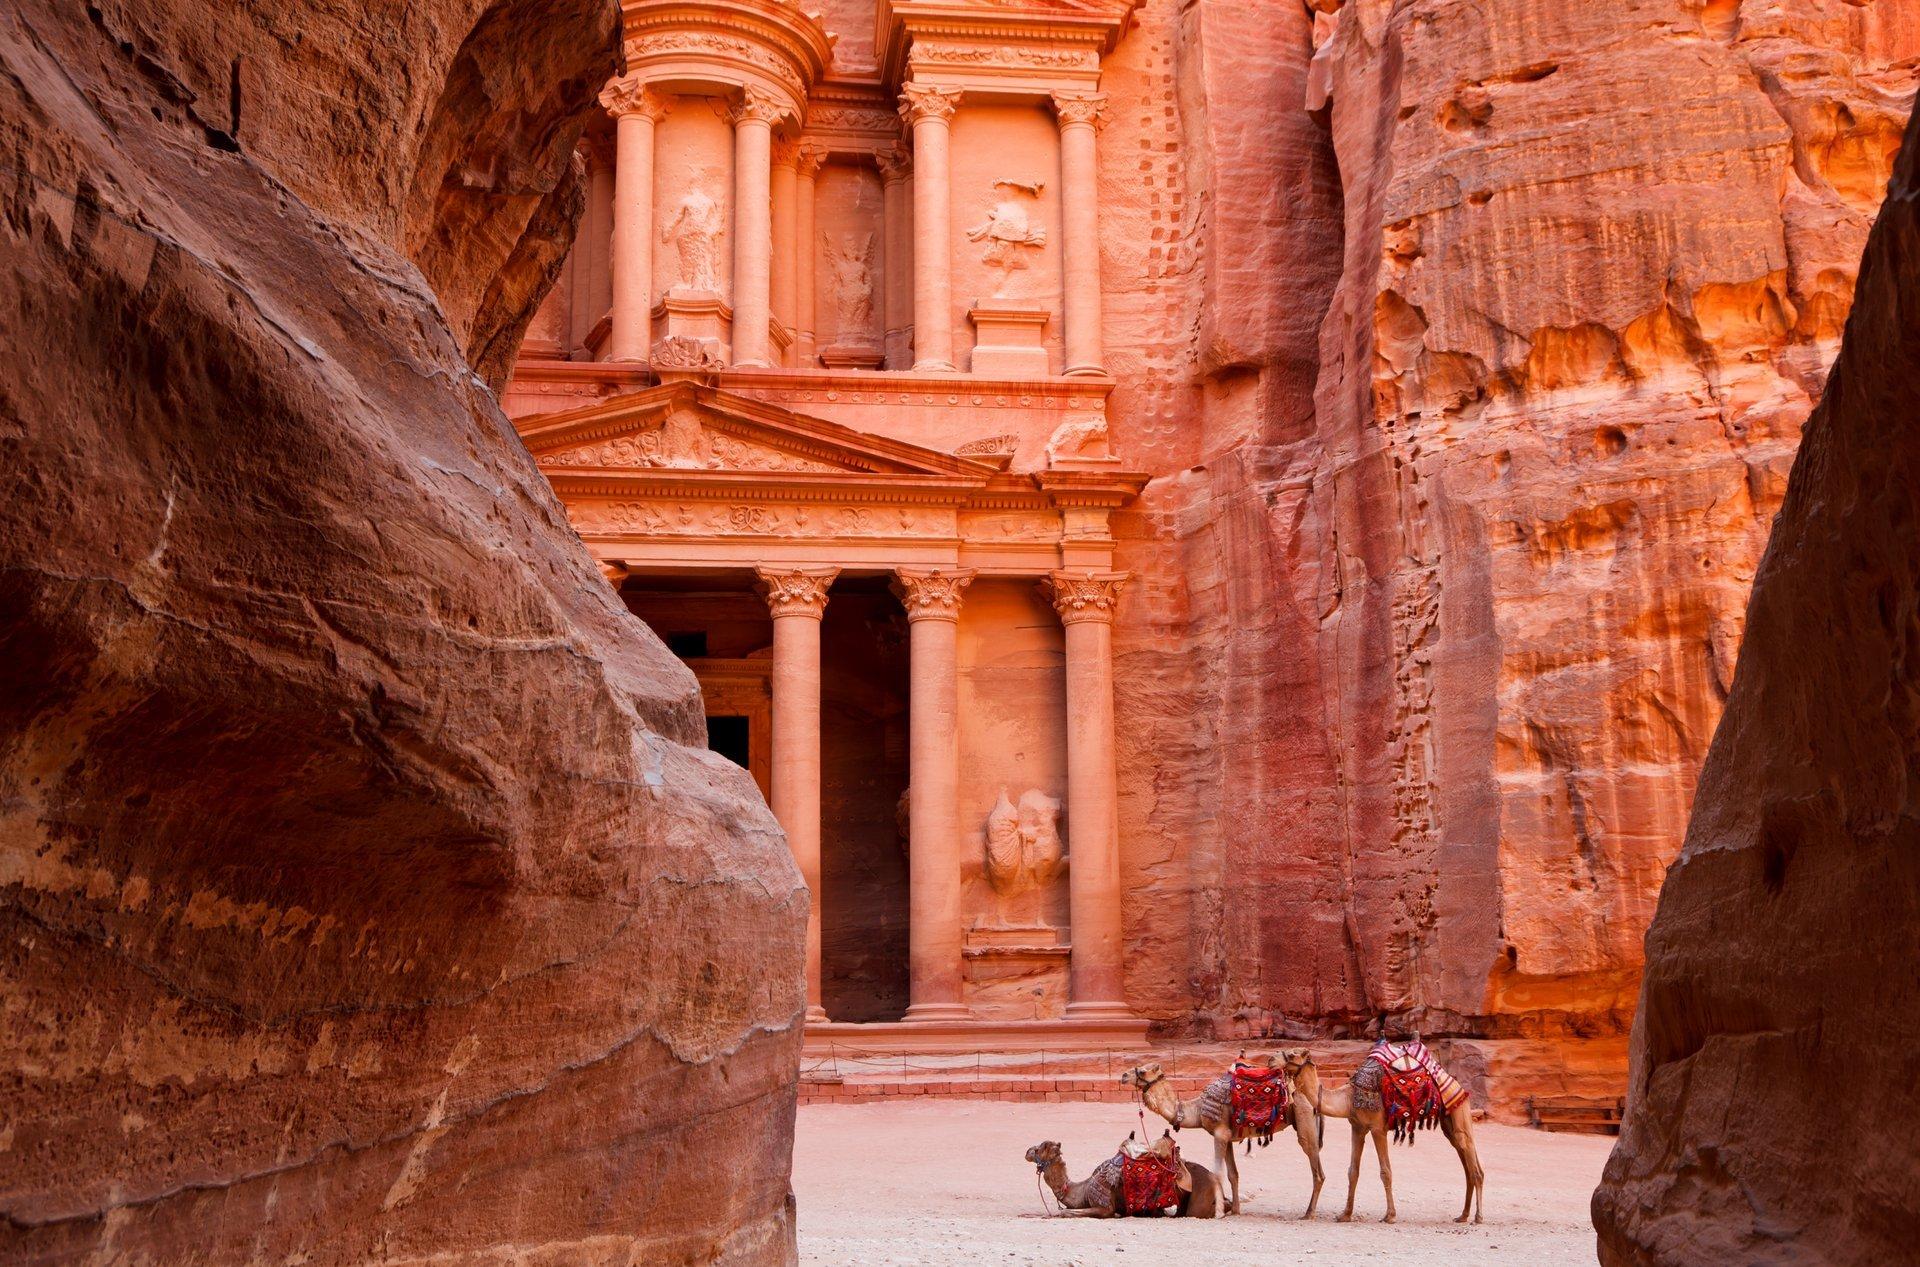 Ancient City of Petra in Jordan - Best Time